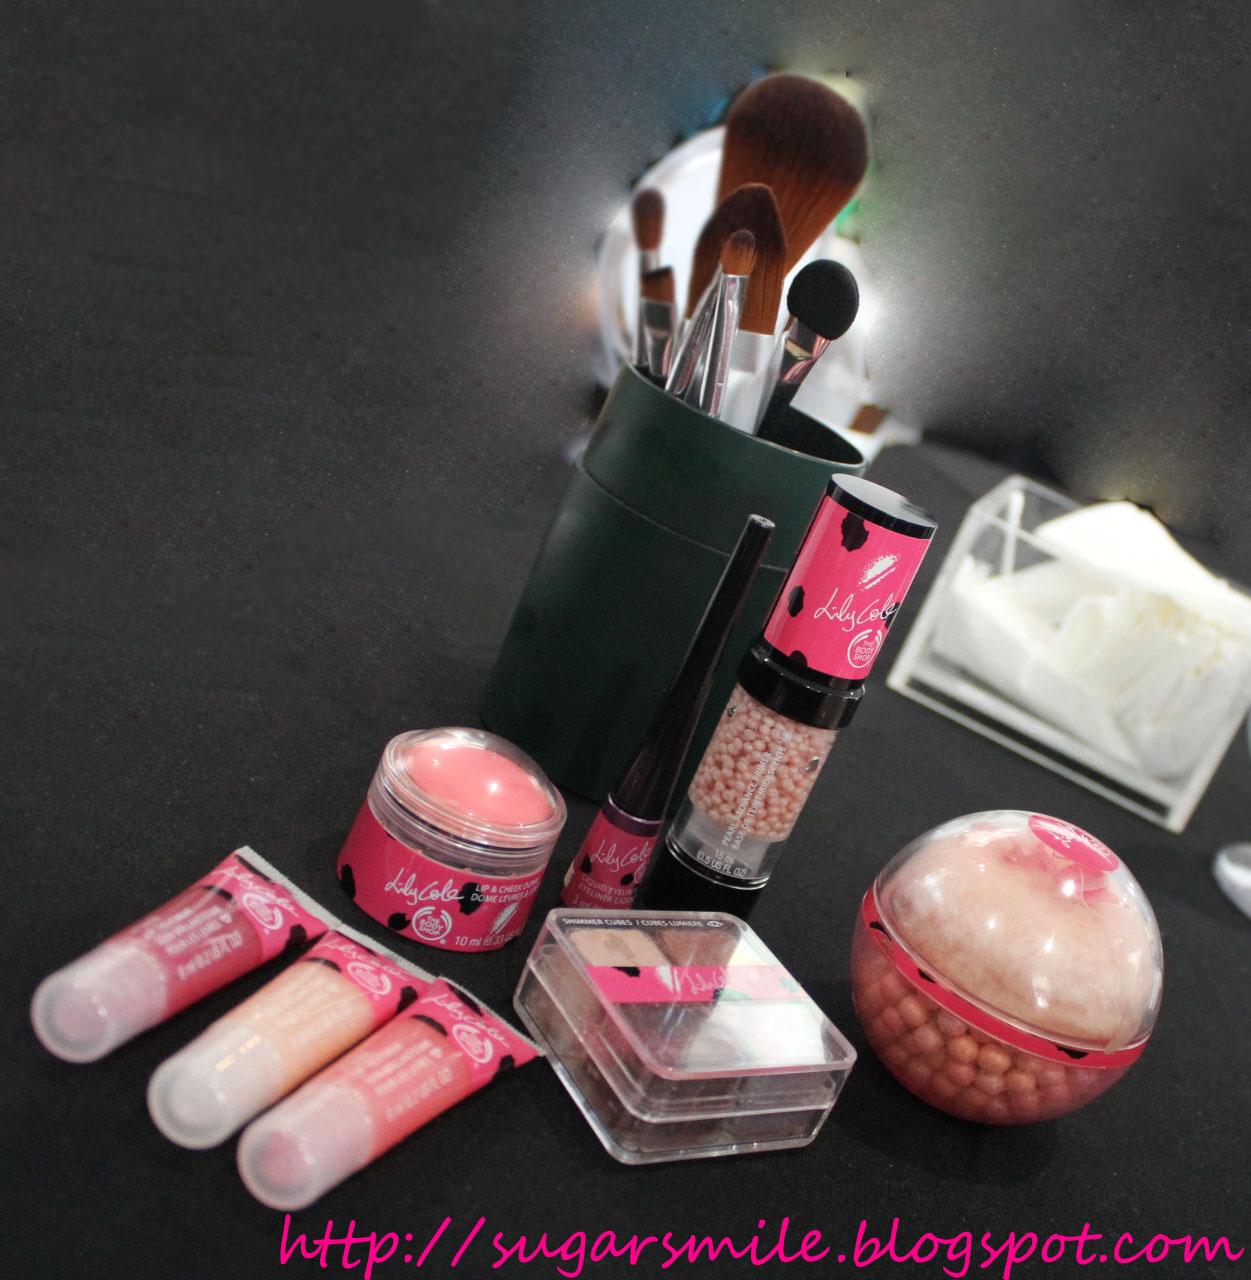 http://1.bp.blogspot.com/-tYVw9lyOyY8/T-IKB16RdoI/AAAAAAAACng/C_w7fuxsN30/s1600/The+Body+Shop+Lily+Cole+1.jpg